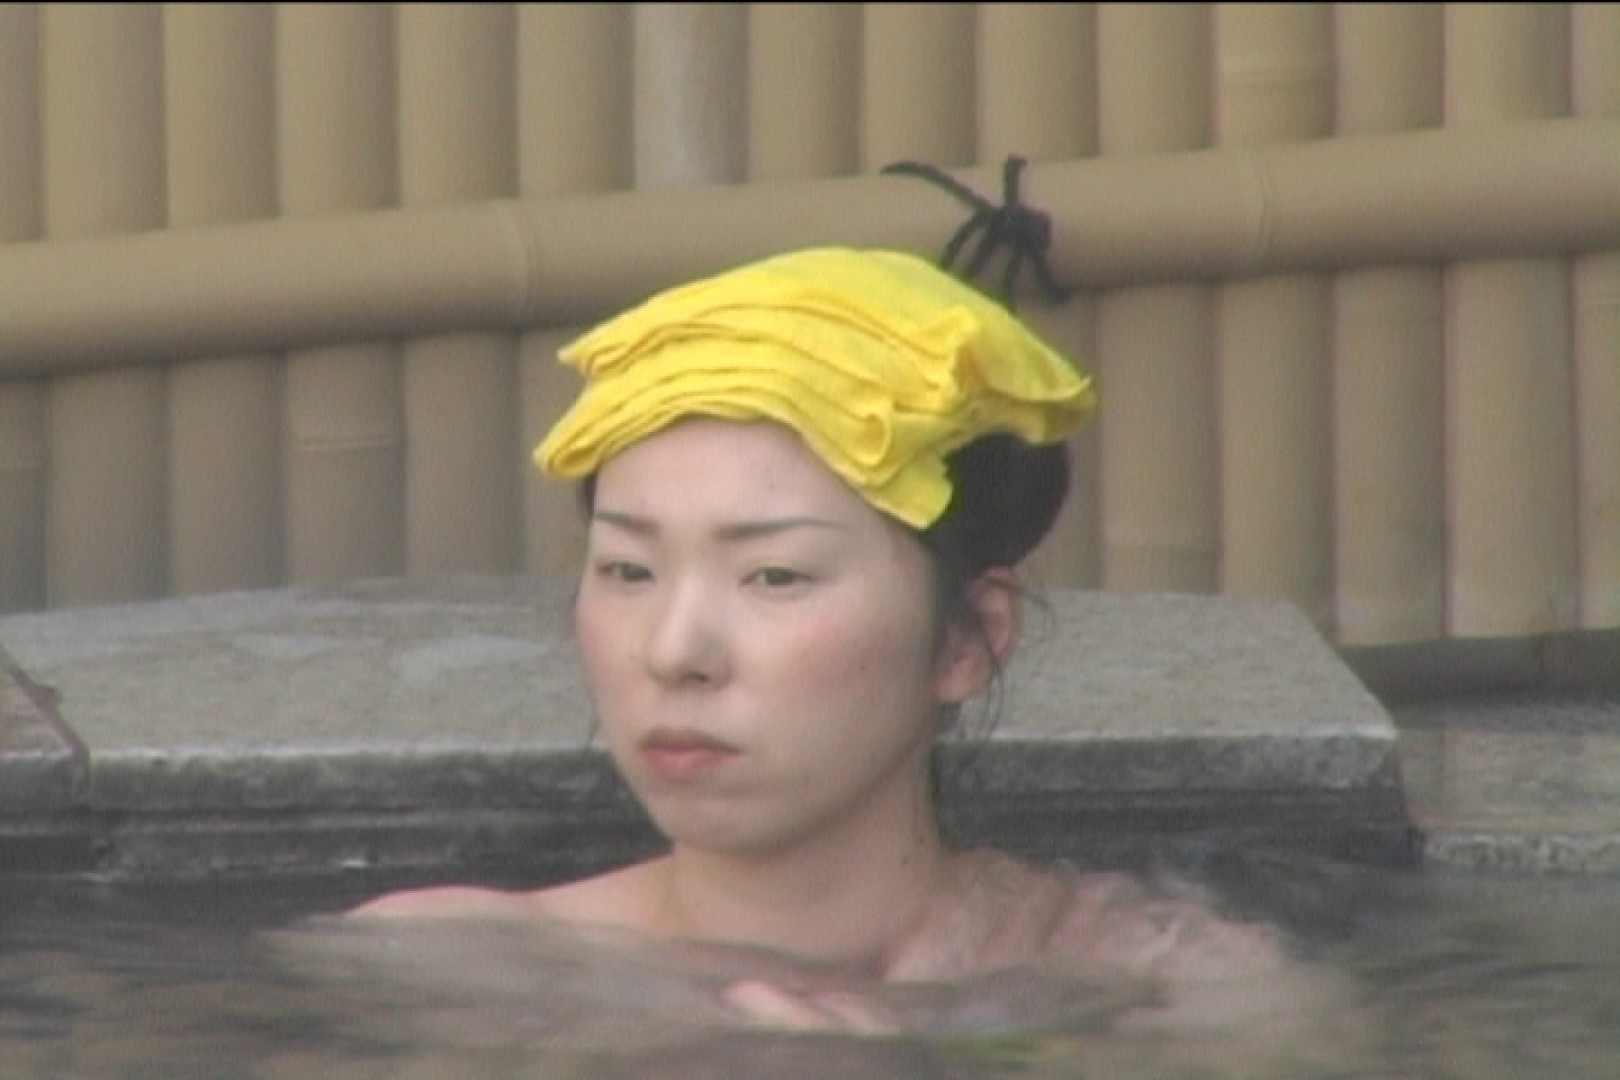 Aquaな露天風呂Vol.529 盗撮シリーズ | 露天風呂編  106PIX 73